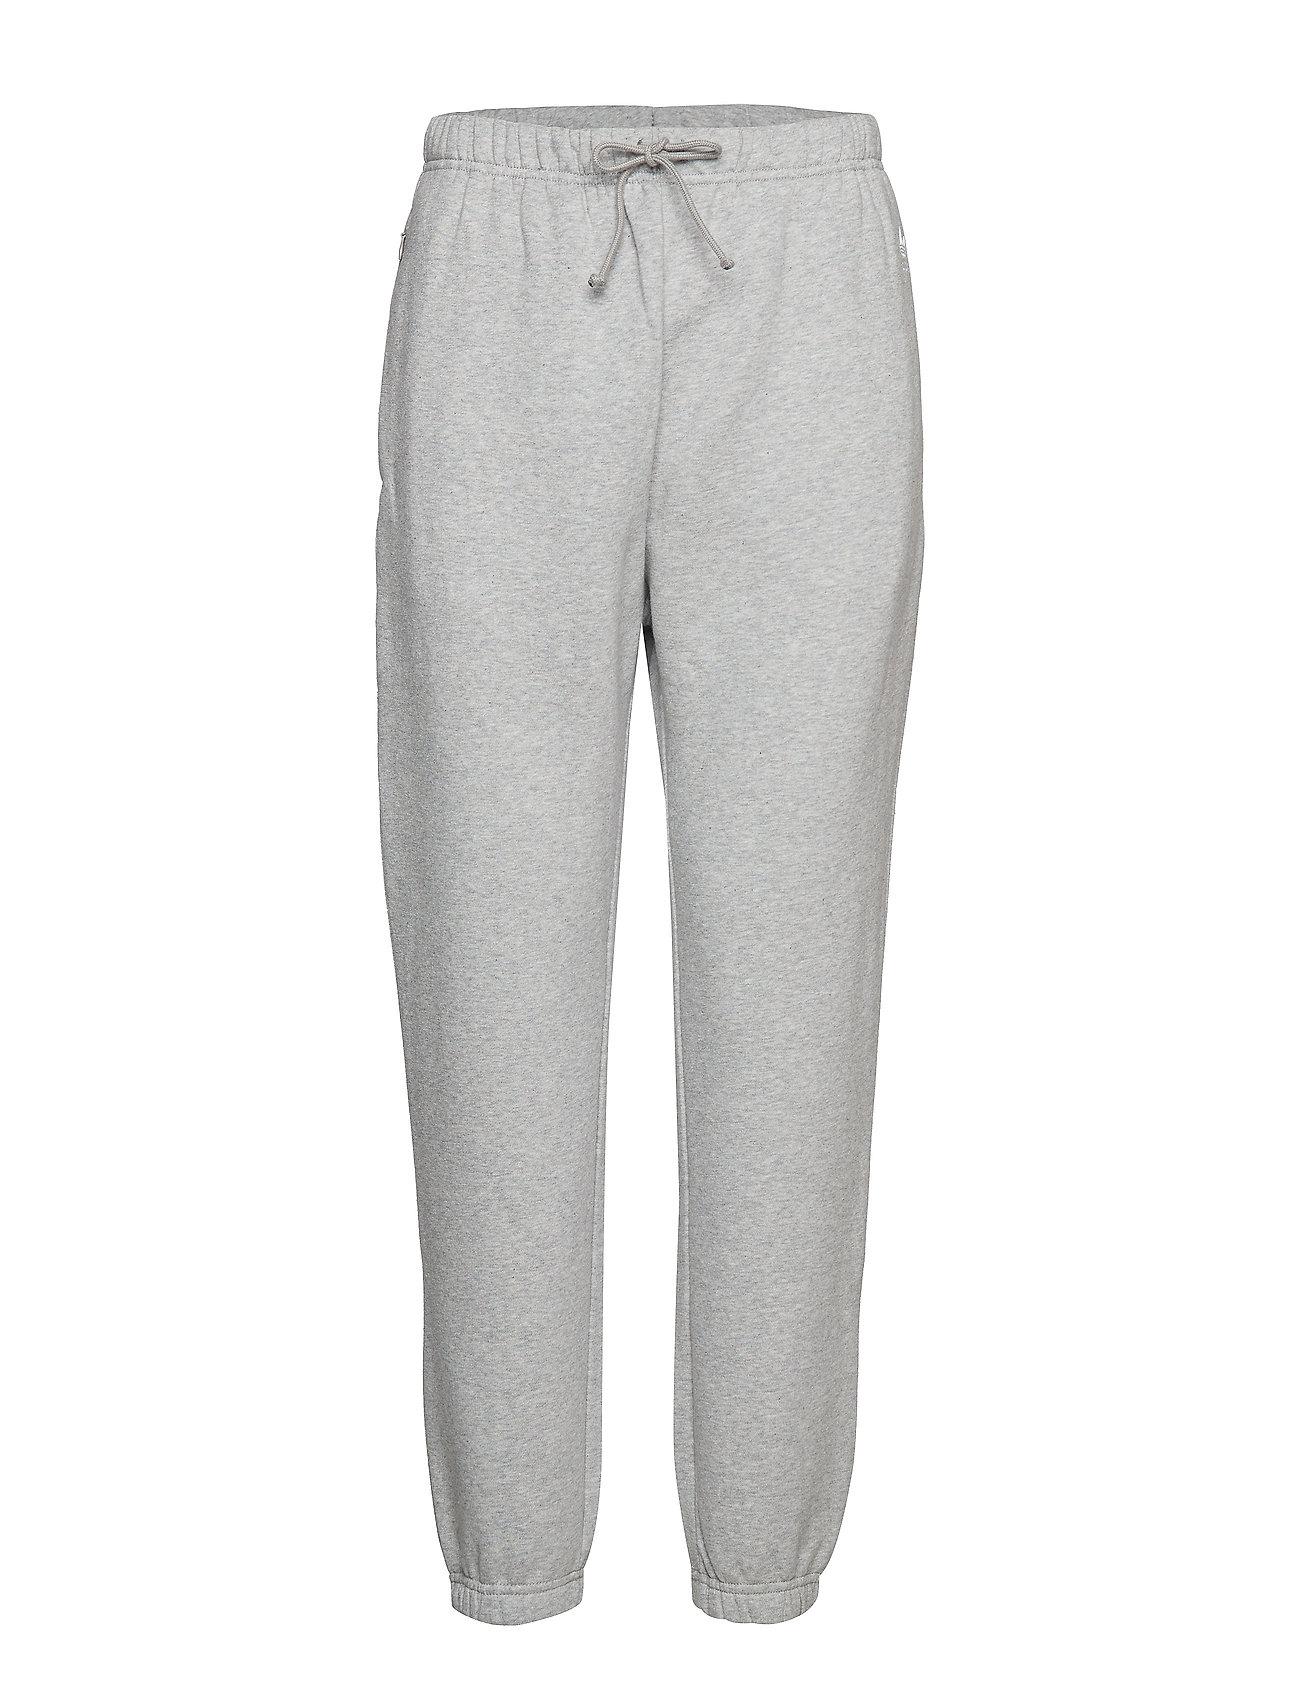 Adidas Originals SC PANT Sweatpants